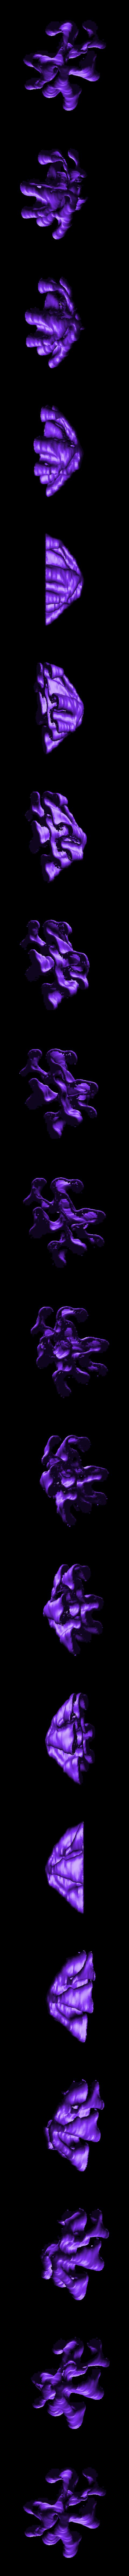 gro8.stl Download free STL file Weird terrain collection • 3D printer object, ferjerez3d